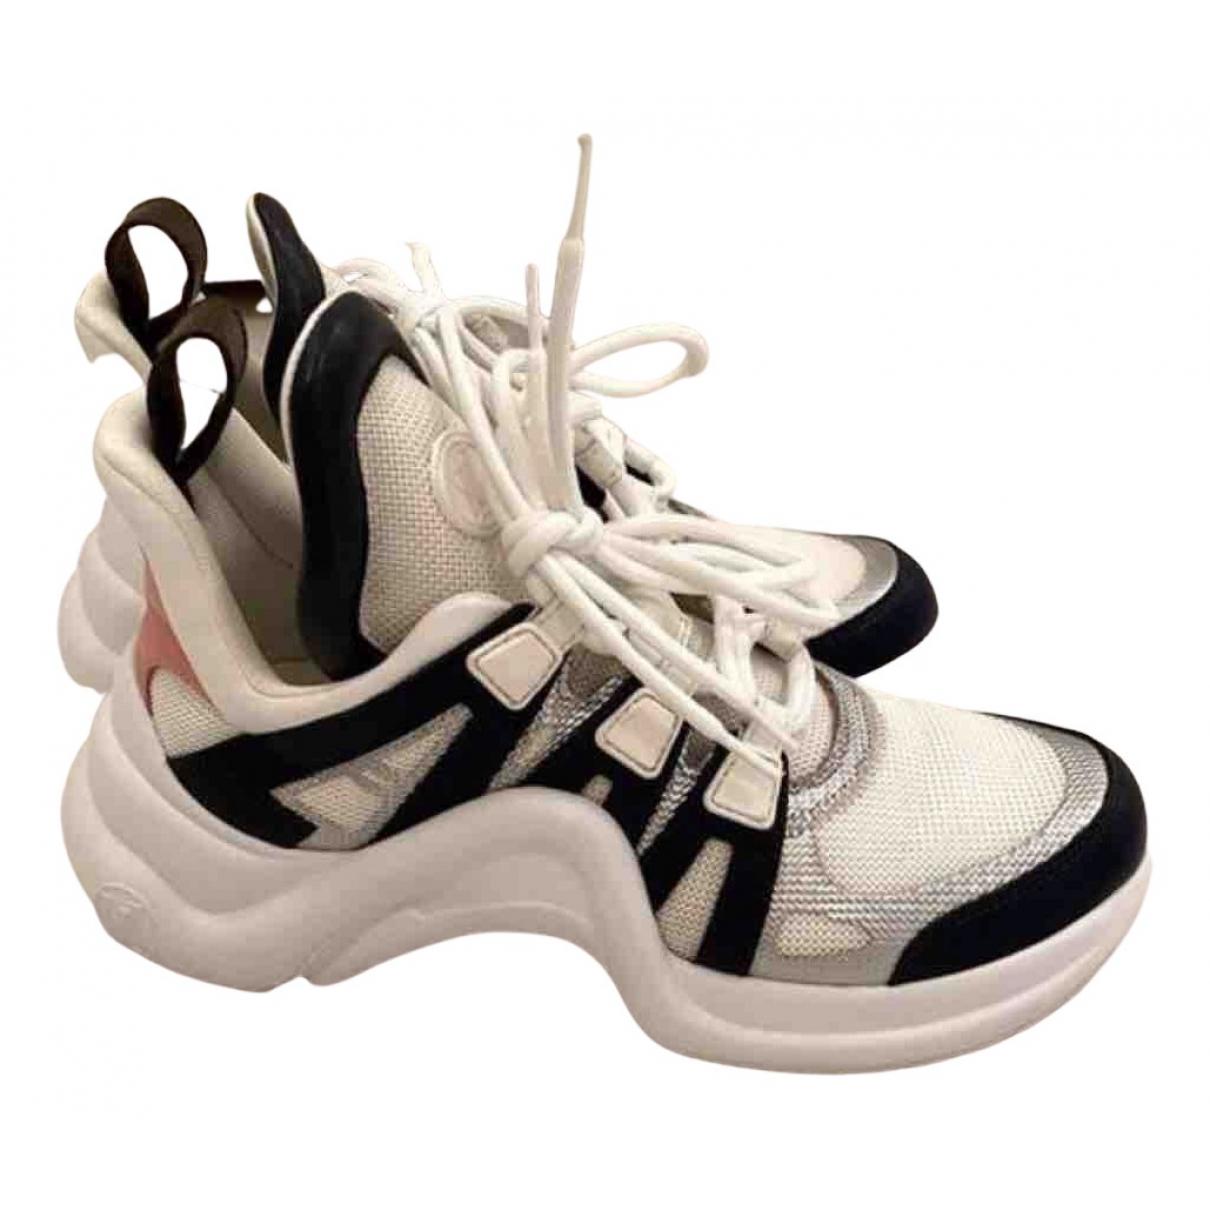 Louis Vuitton Archlight Sneakers in  Bunt Leder